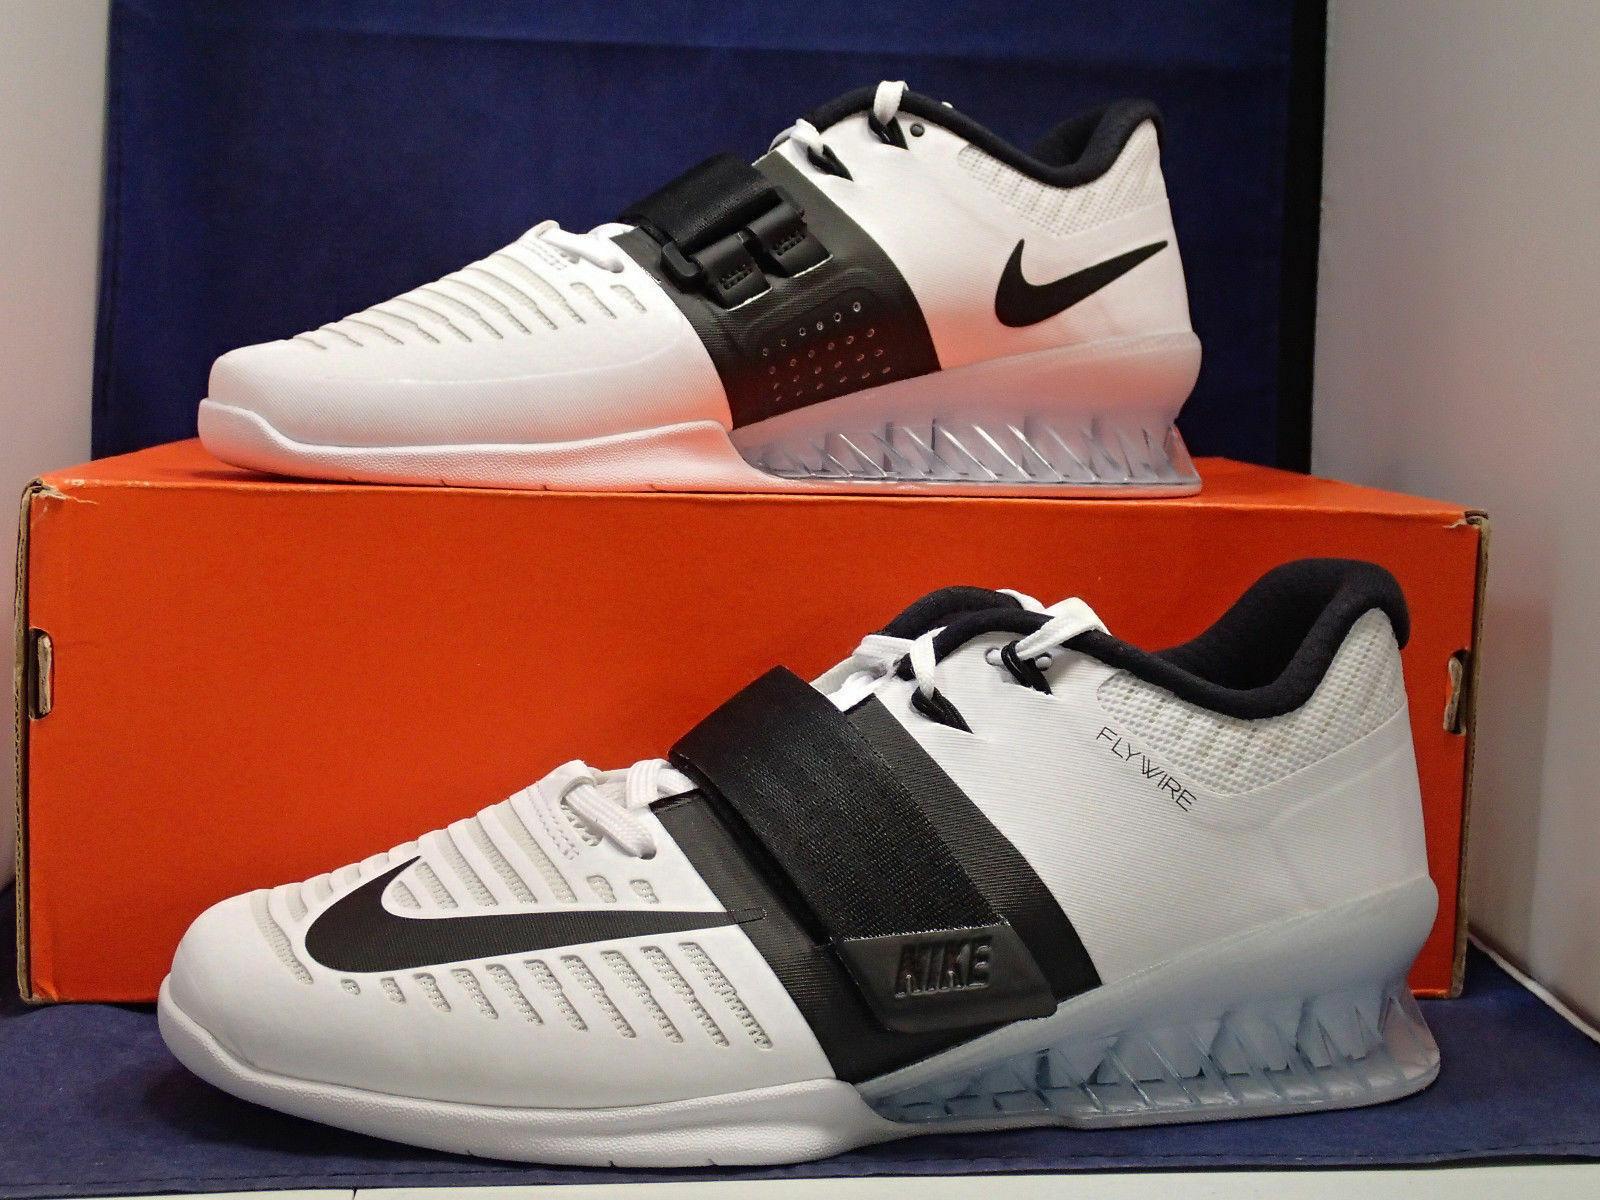 Nike Romaleos 3 3 3 Weightlifting Training shoes White Black (852933-101) Sz 13 cc161b